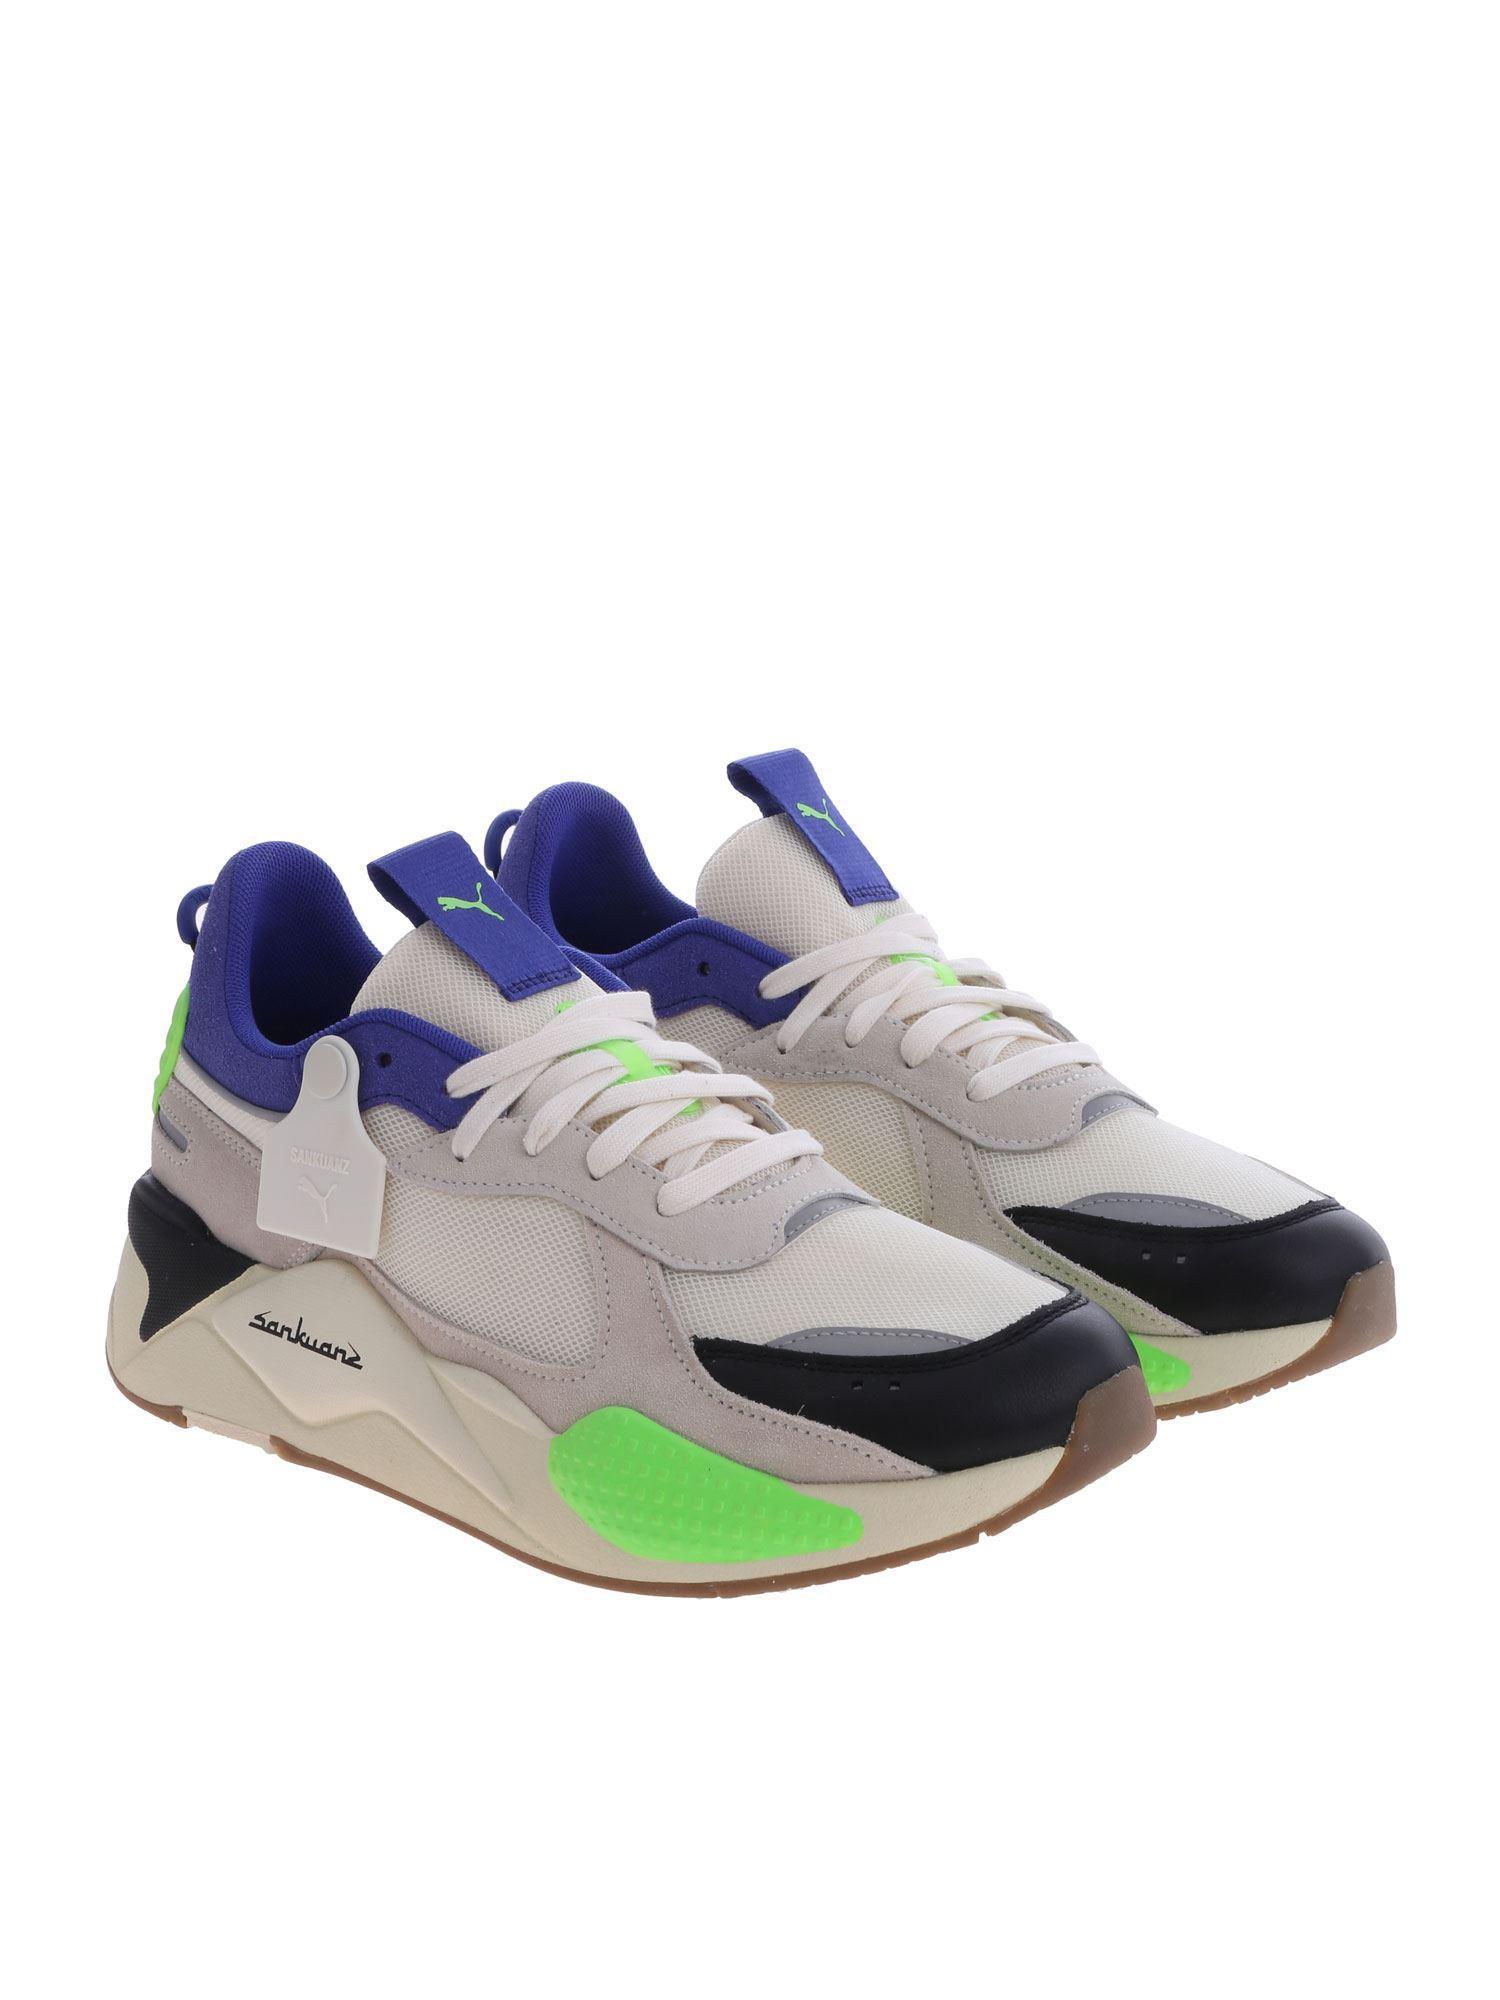 a2c24ecbb9f Lyst - PUMA Rs-x Sankuanz Cream-colored Sneakers in Blue for Men - Save 18%